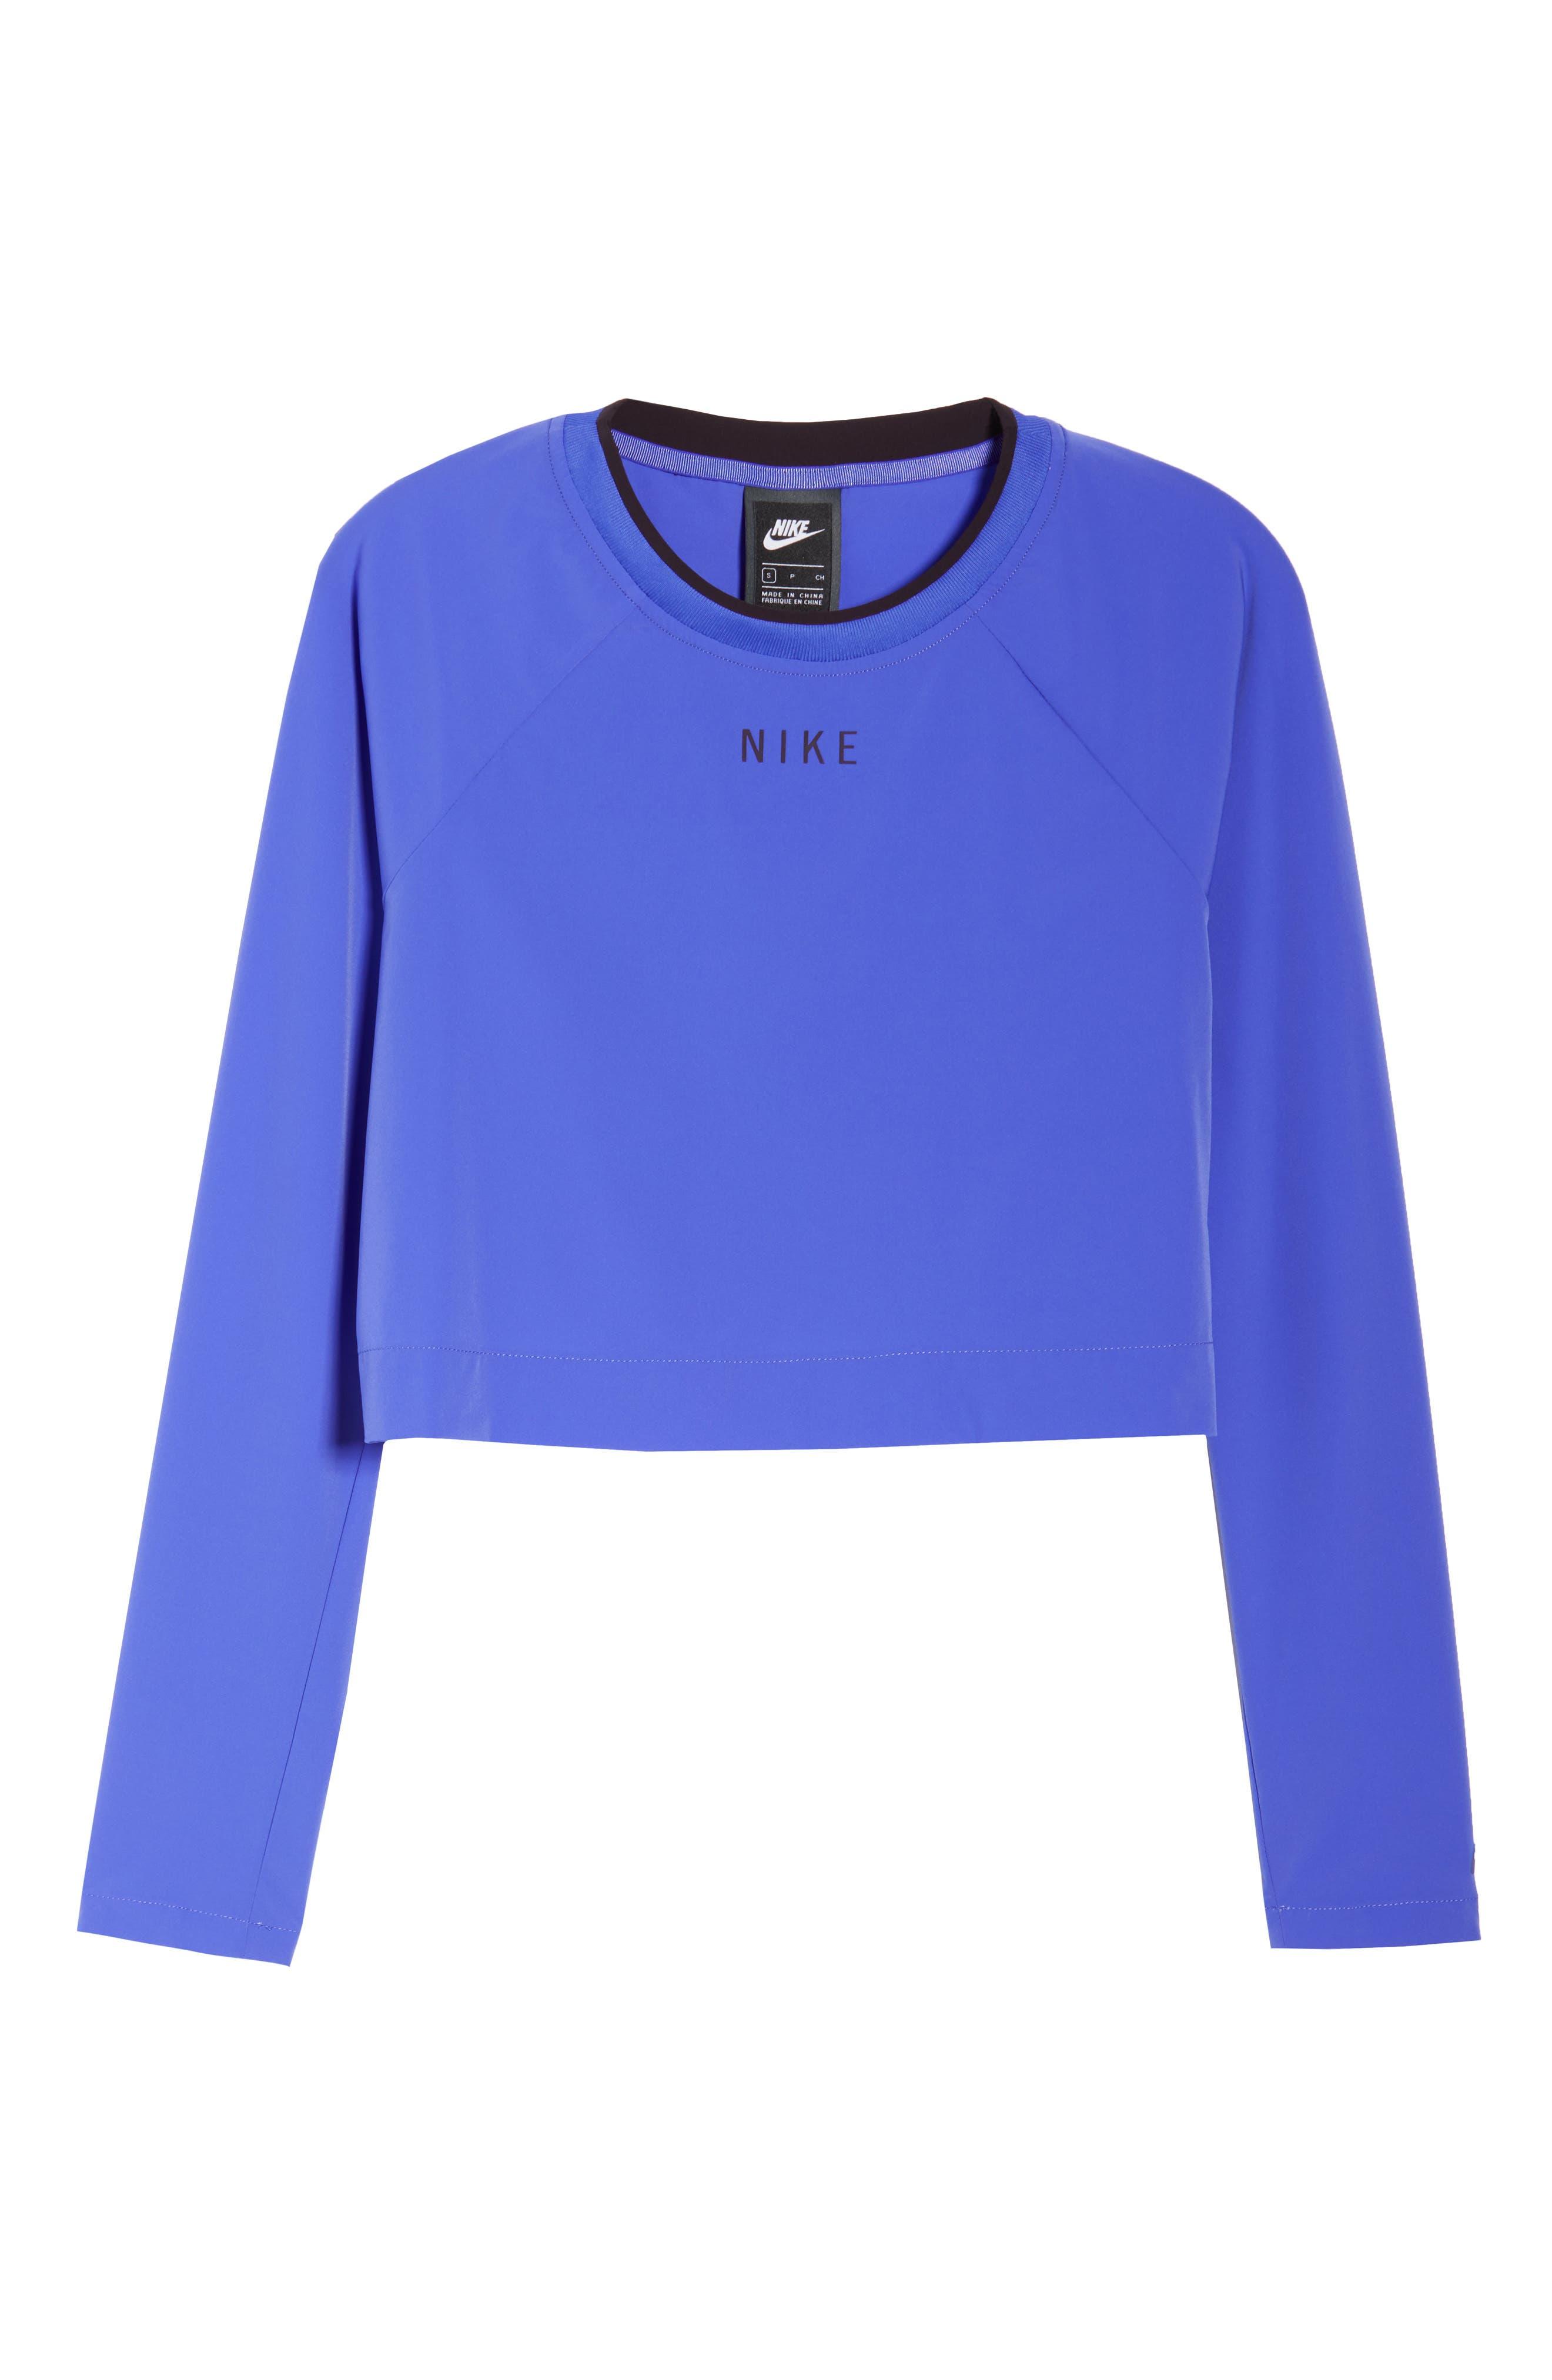 Sportswear Tech Pack Women's Long Sleeve Top,                             Alternate thumbnail 7, color,                             PERSIAN VIOLET/ BURGUNDY ASH